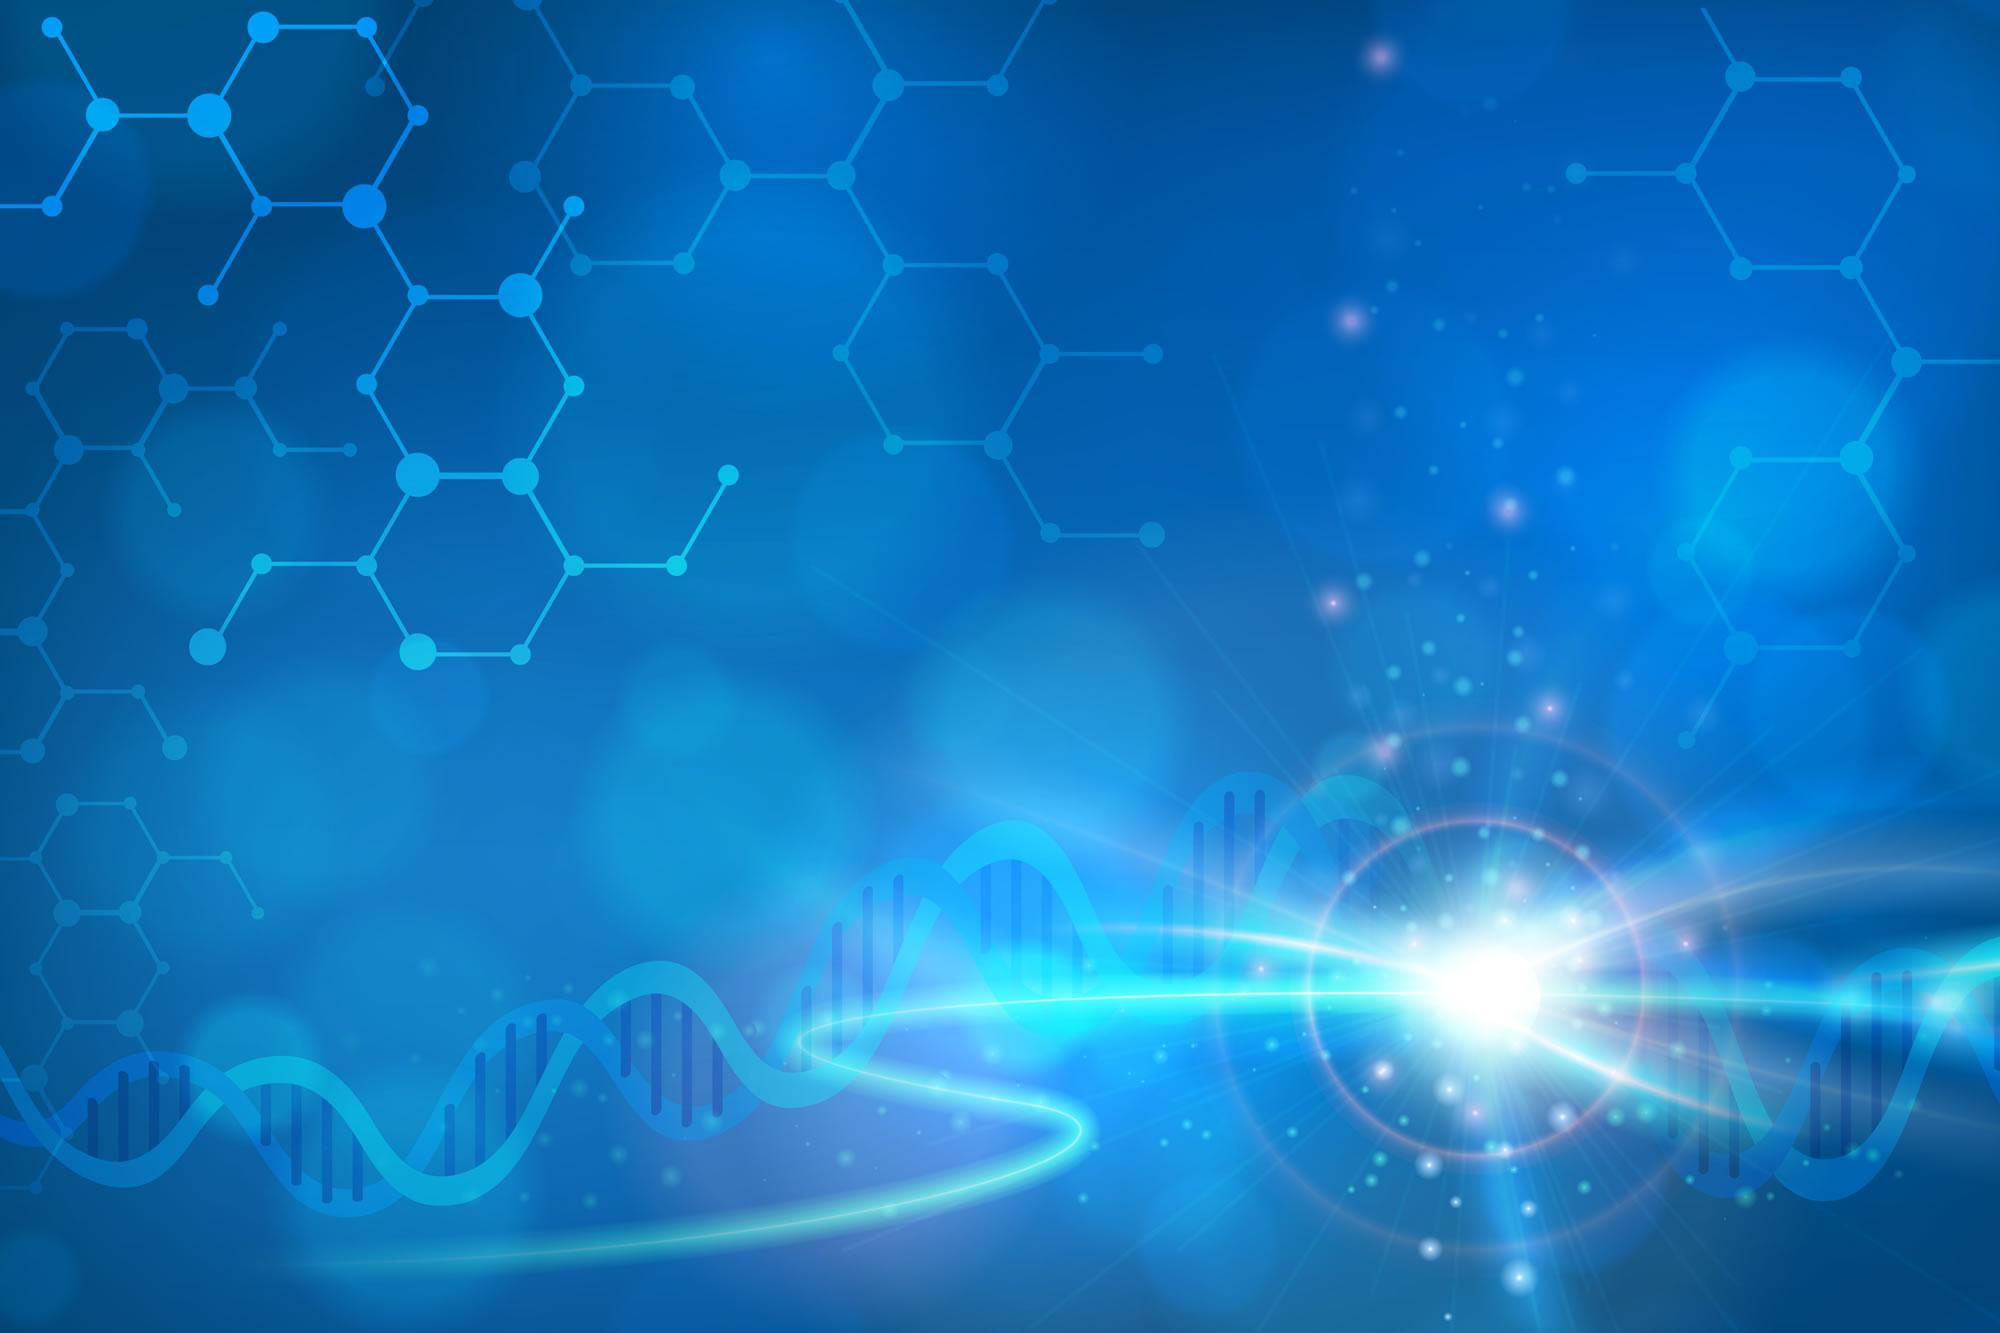 Aurum Biosciences abstract background